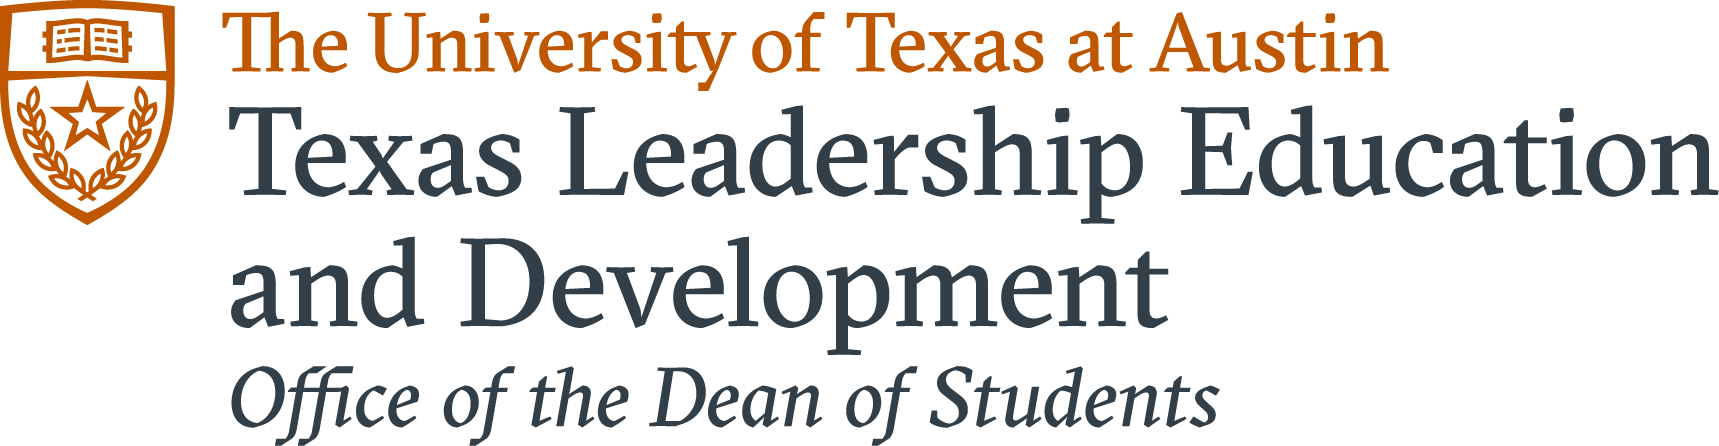 Texas Leadership Education and Development logo